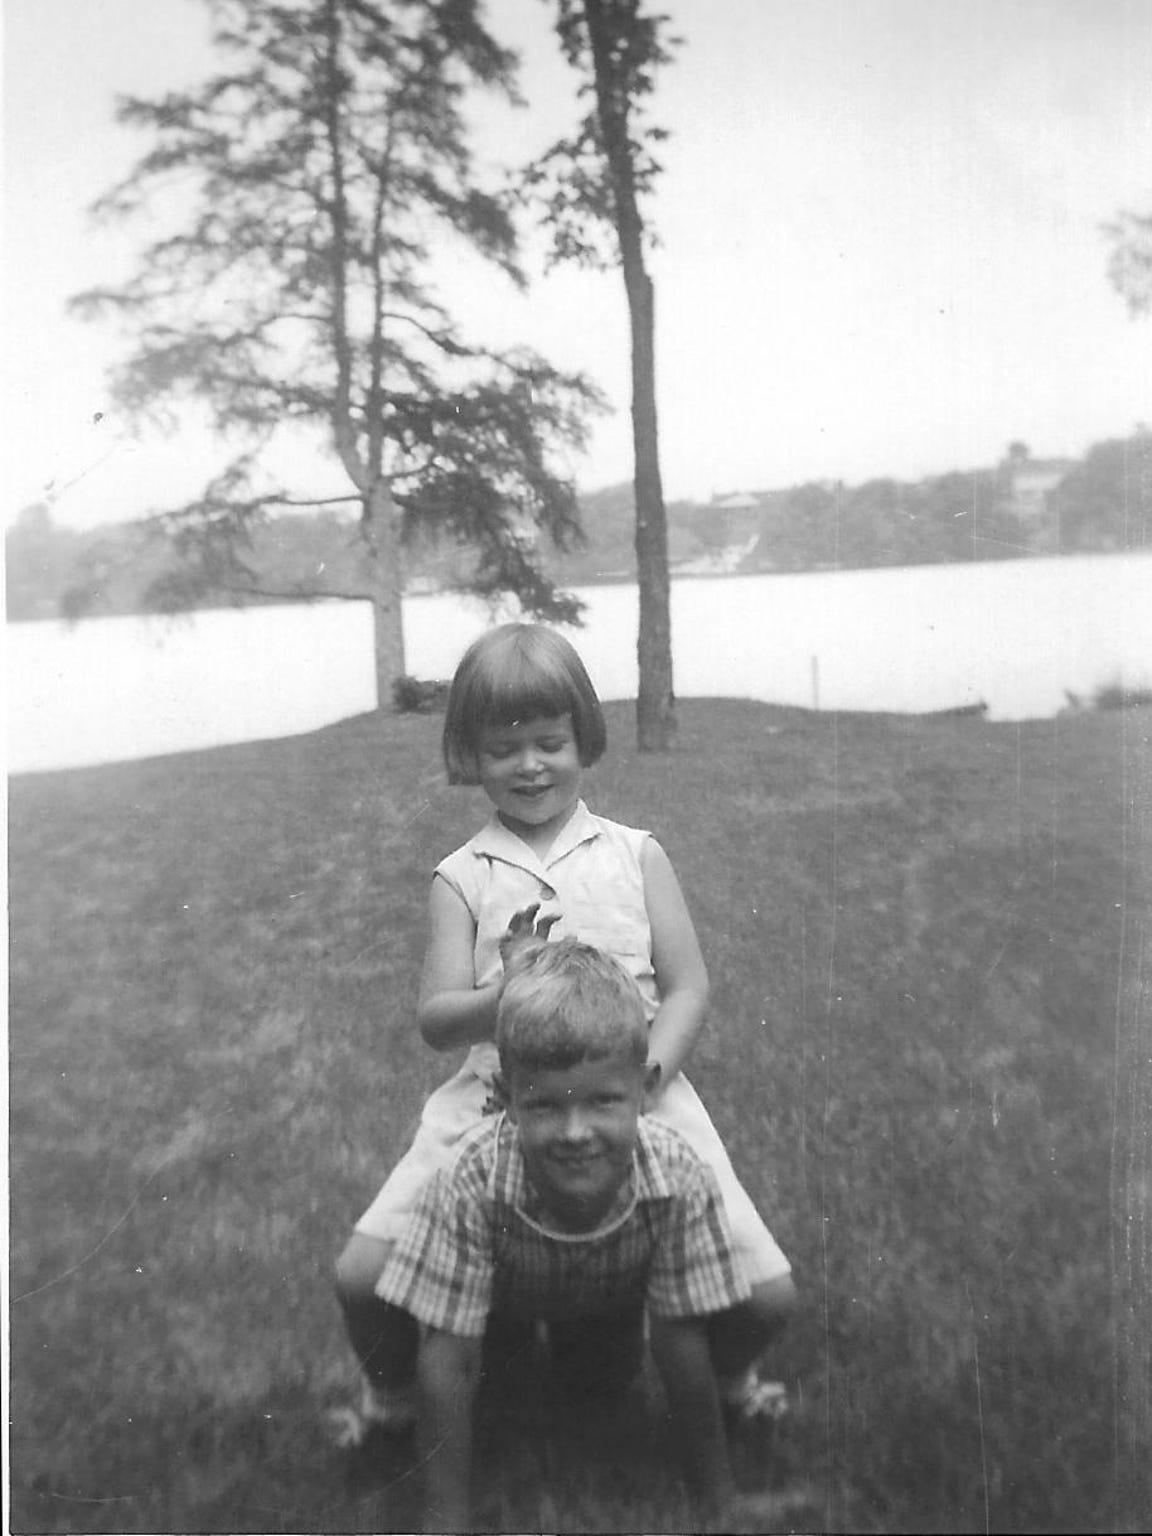 In happier times: A childhood photo of Nancy Henderson